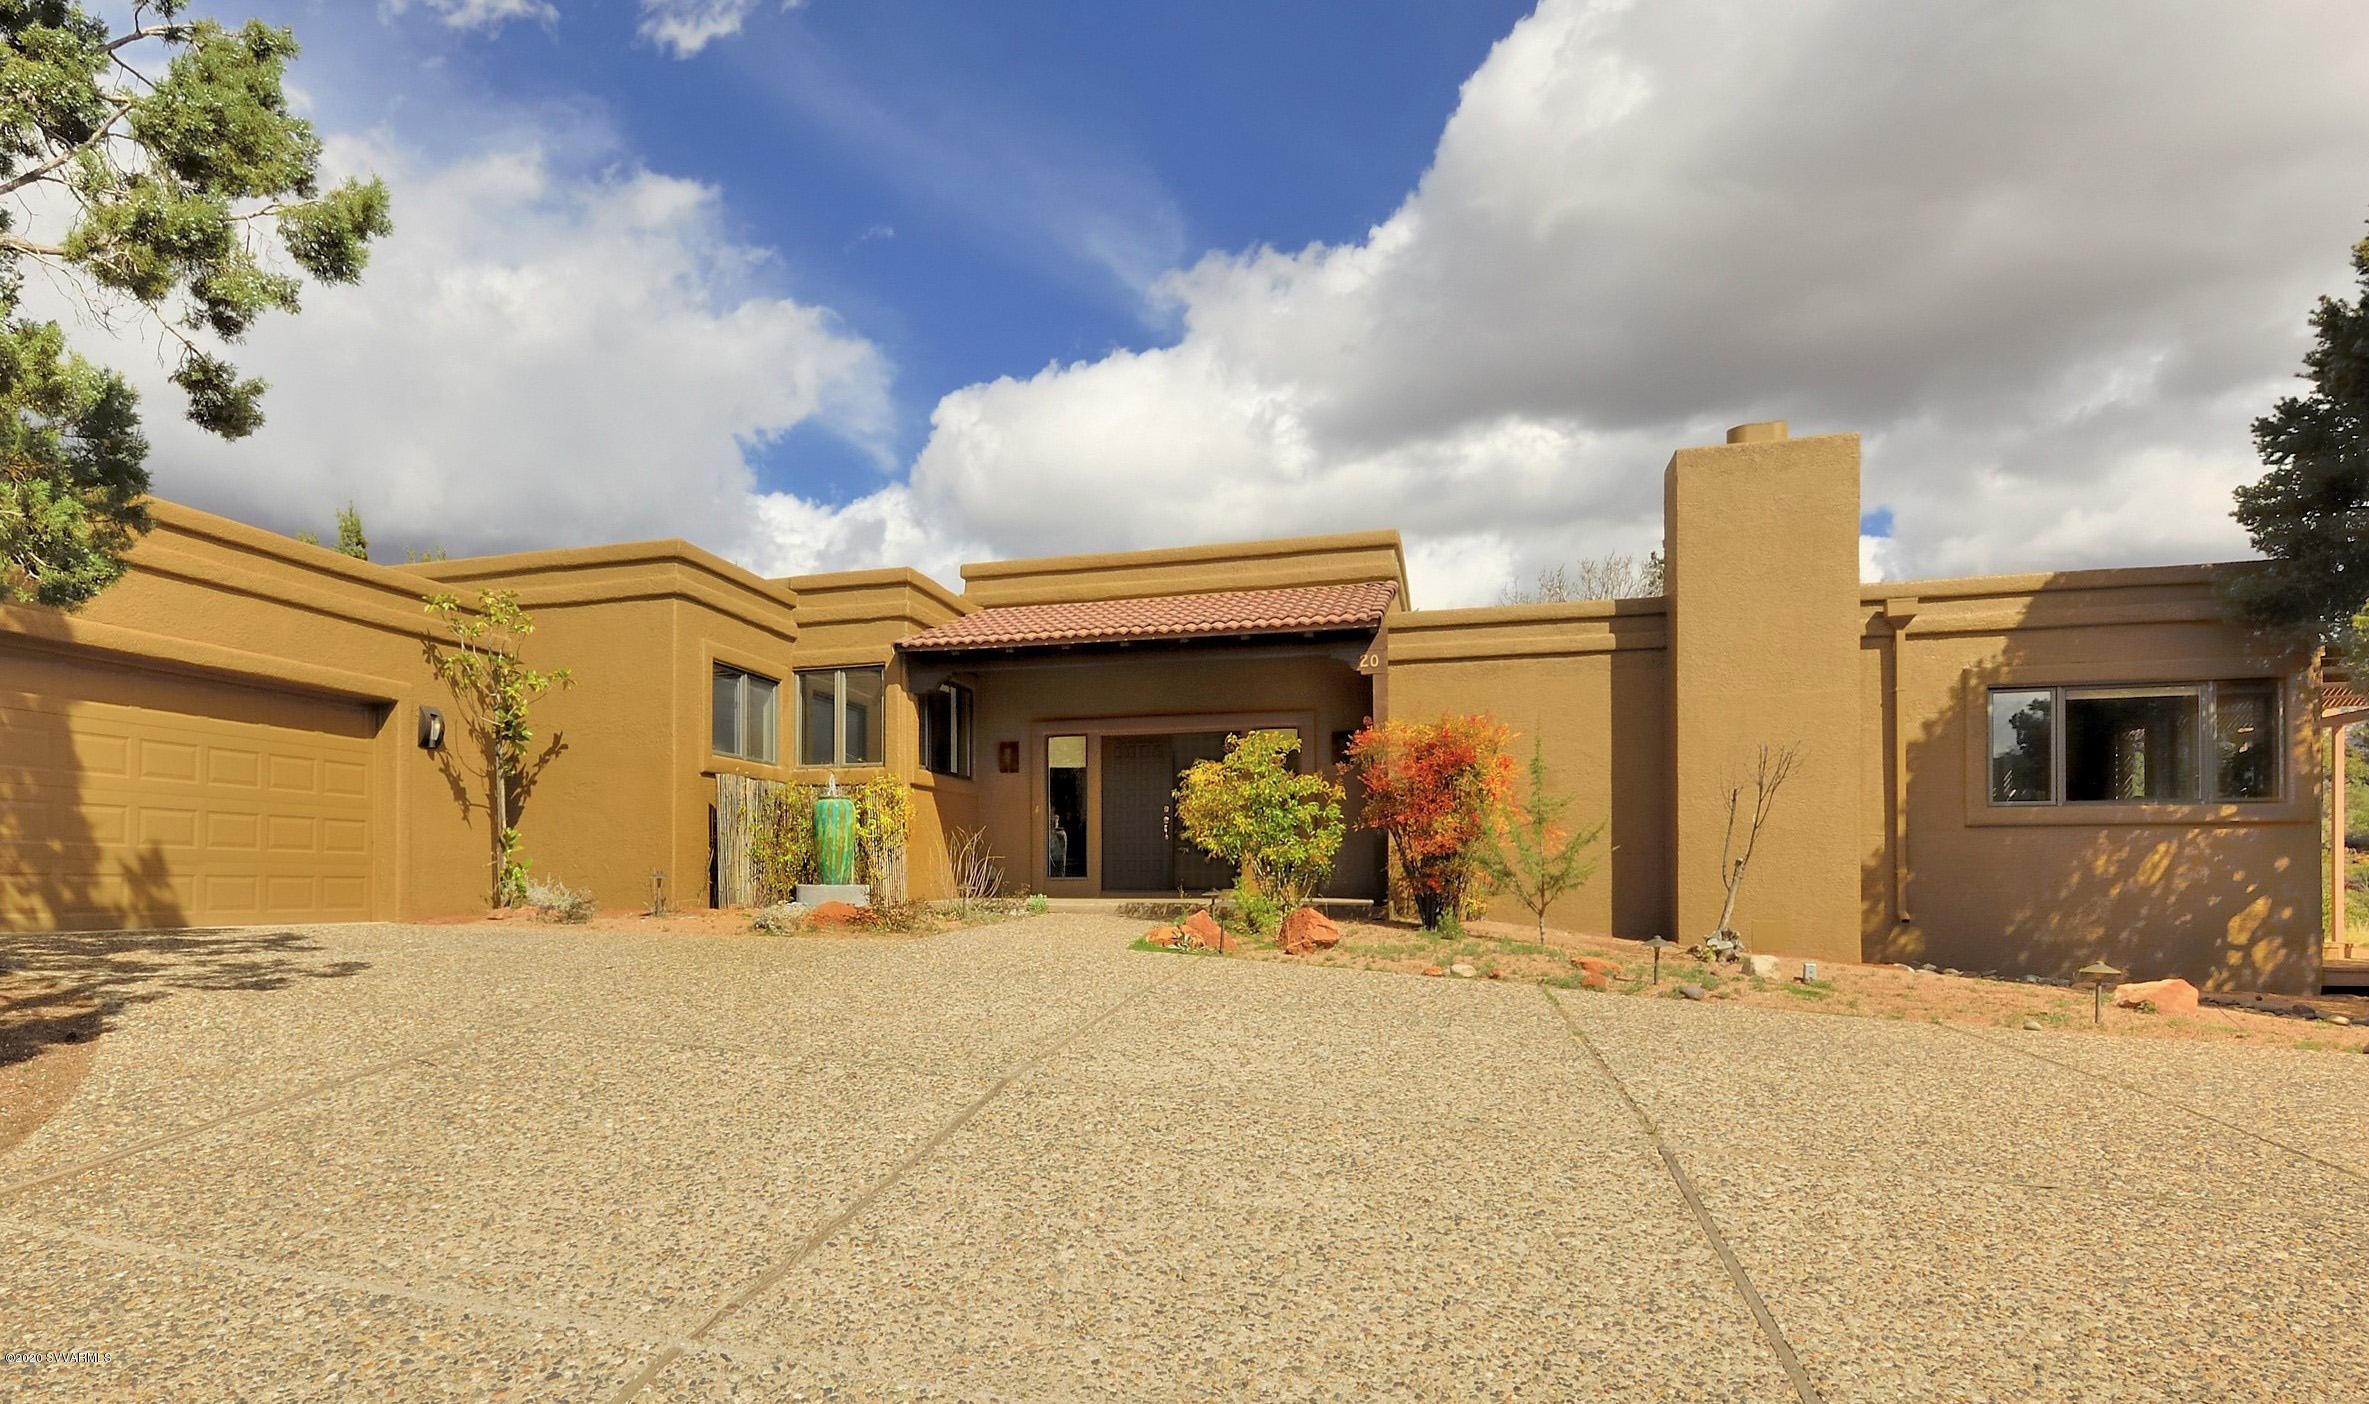 20 Mission Rd Sedona, AZ 86336